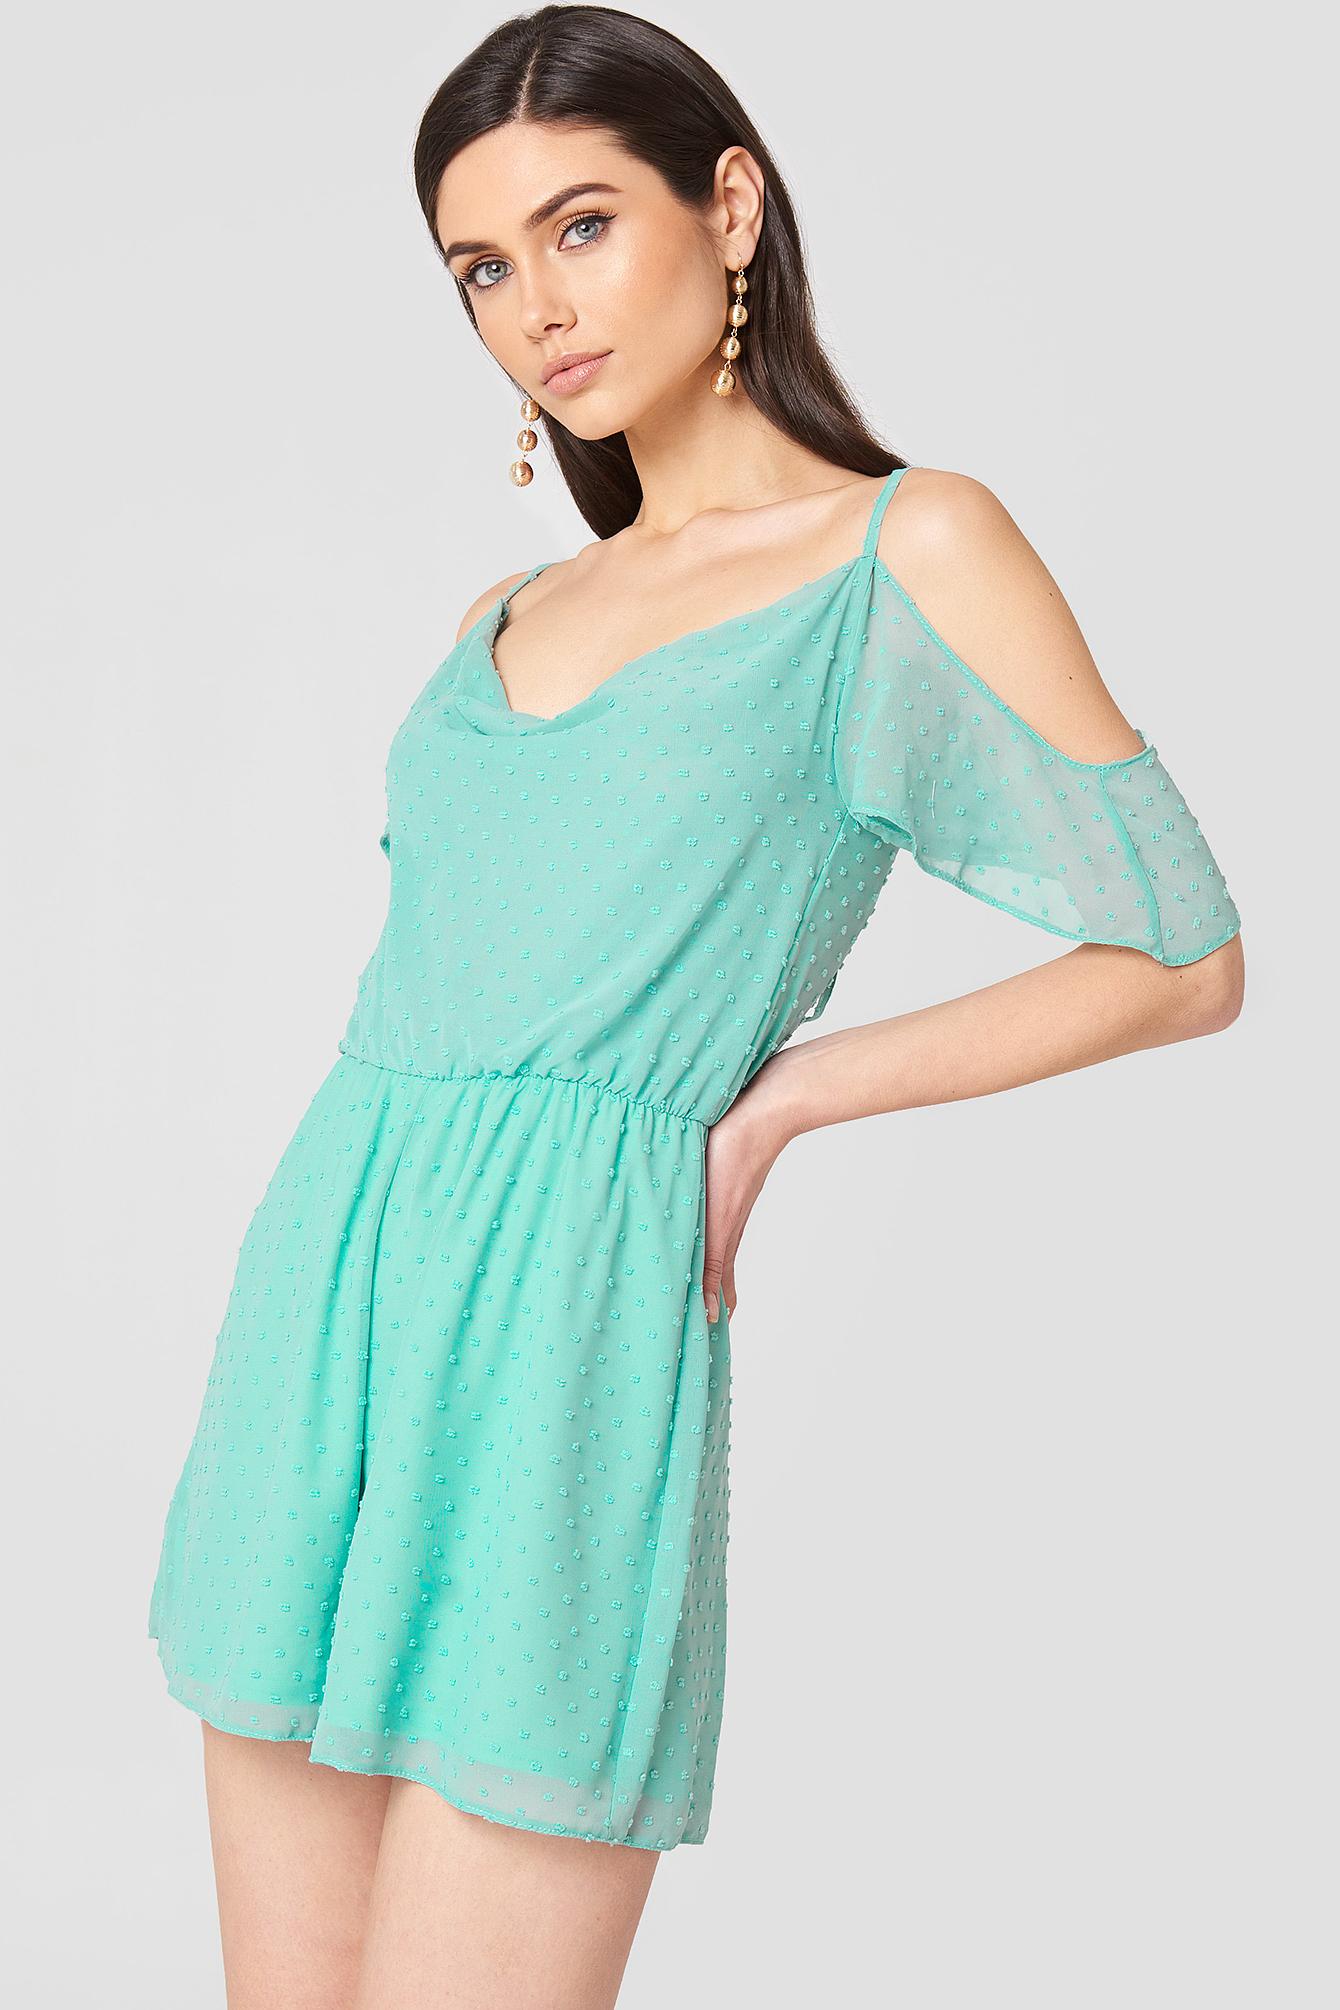 COLD SHOULDER DRESS - GREEN, TURQUOISE